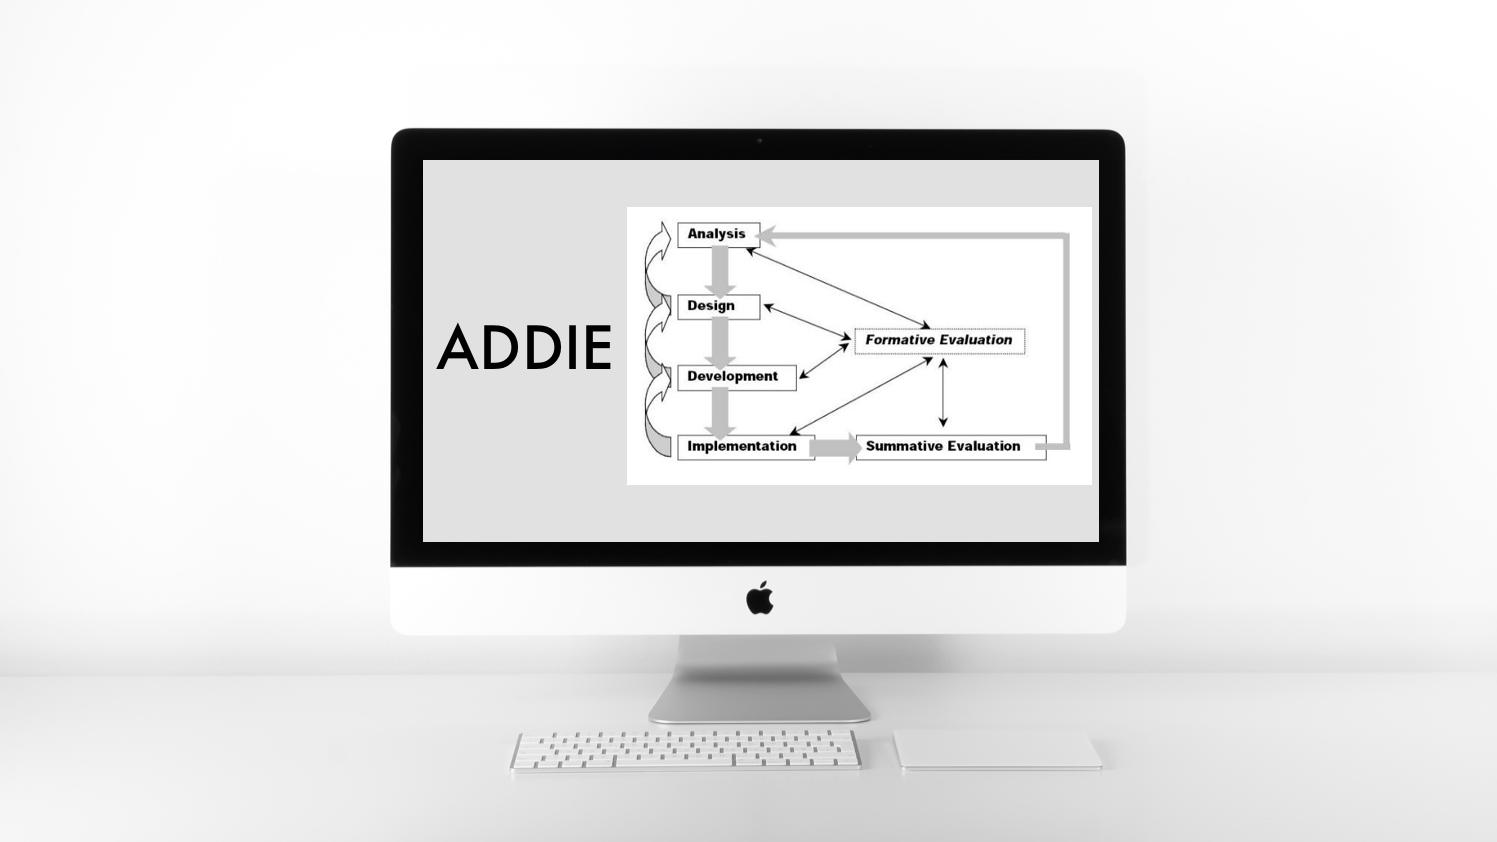 addie the classic instructional design model [ 1497 x 842 Pixel ]